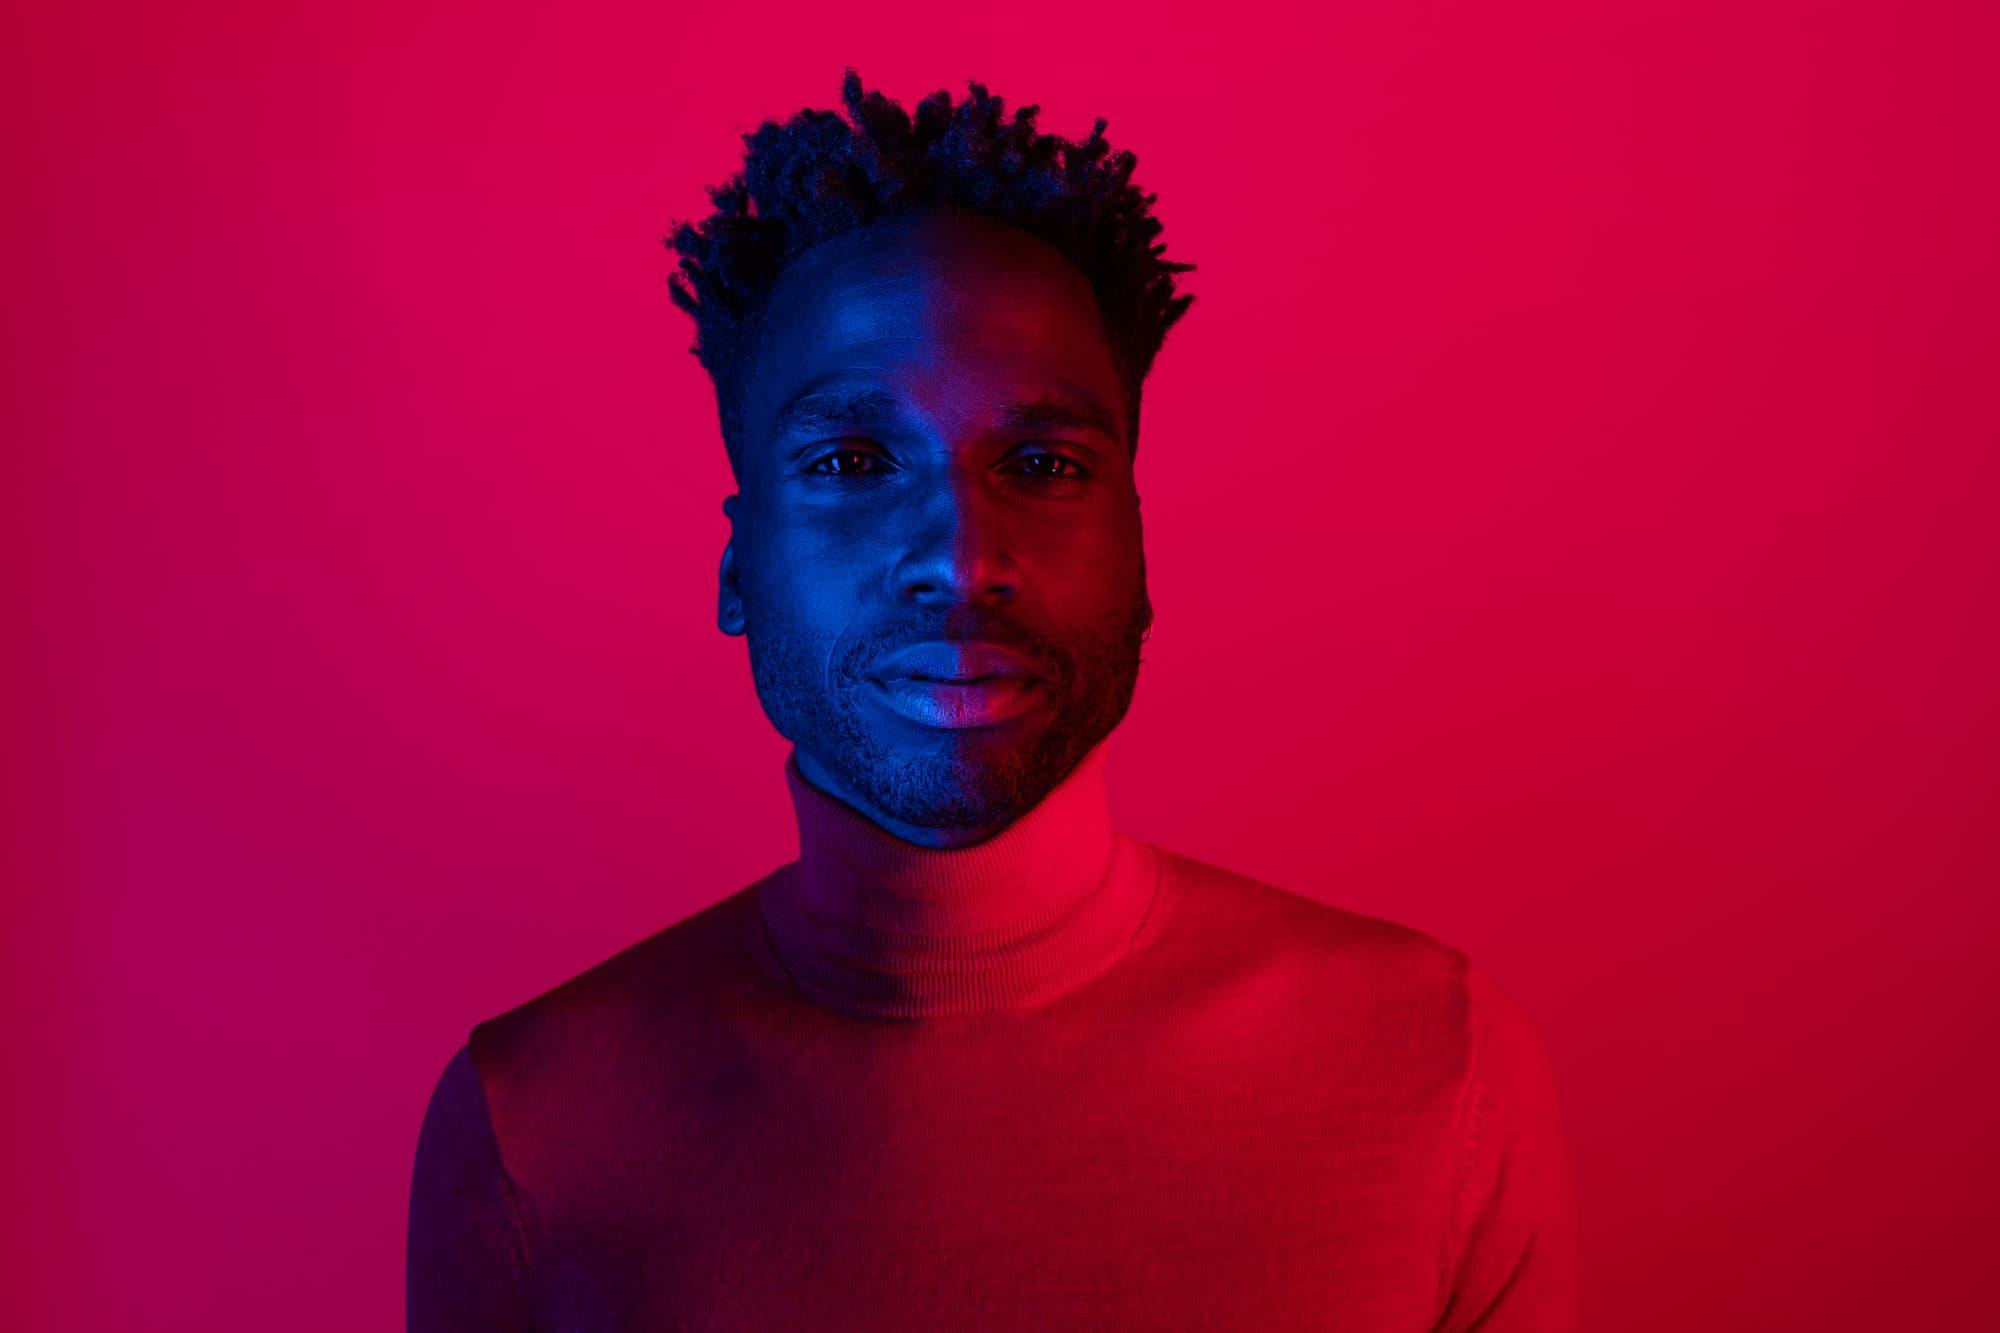 webseite-HolgerAltgeld-Pascal-Nkongo-portraits-012